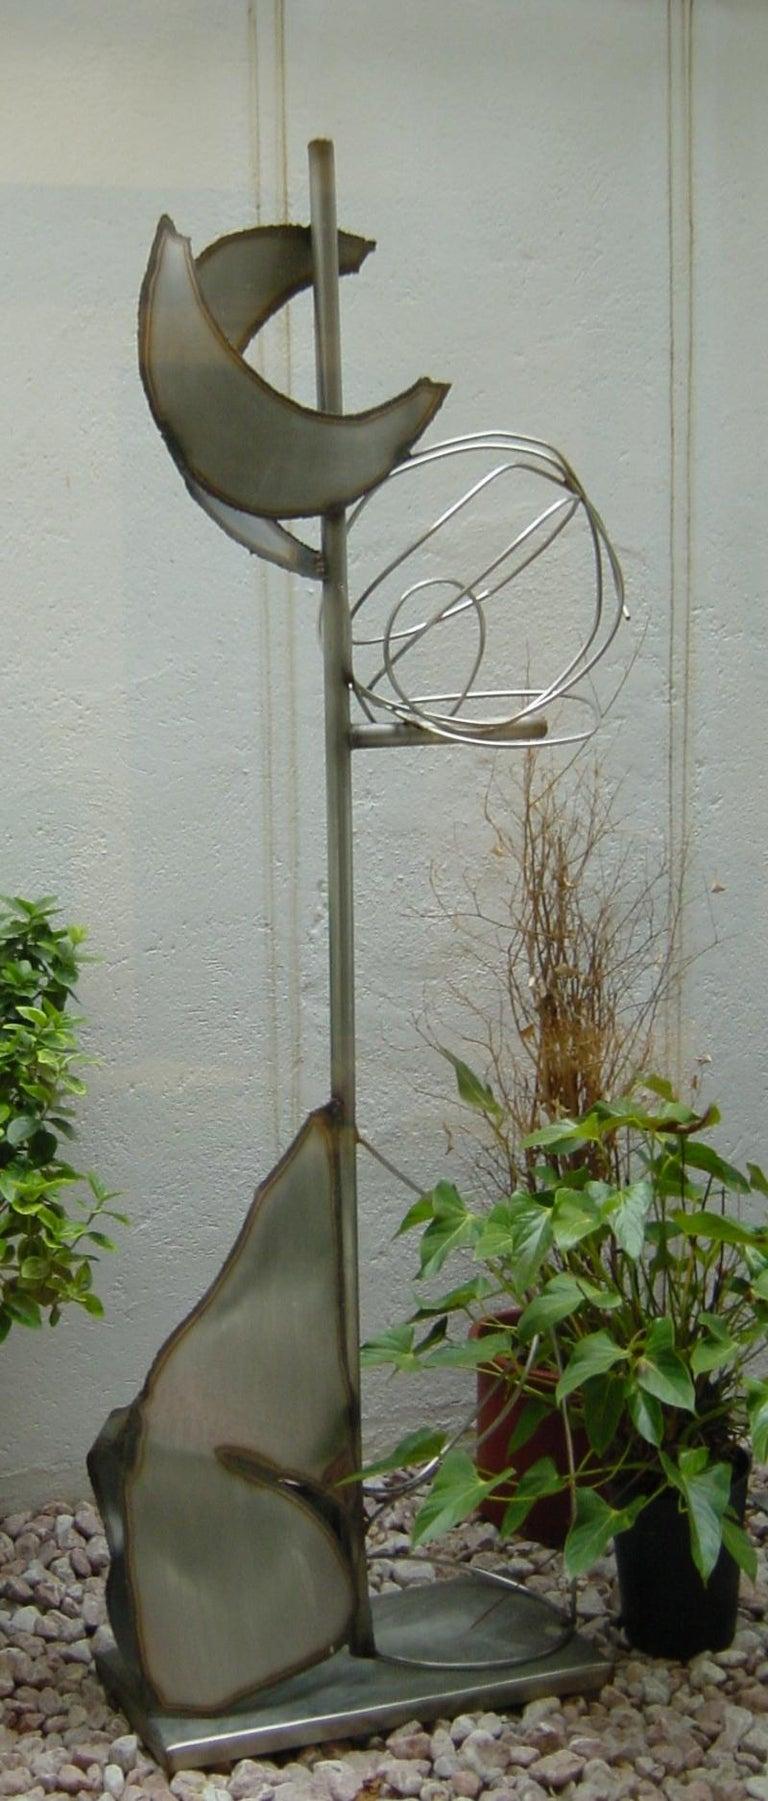 Ferran Soriano Figurative Sculpture - Quimeres original coontemporary steel esculpture